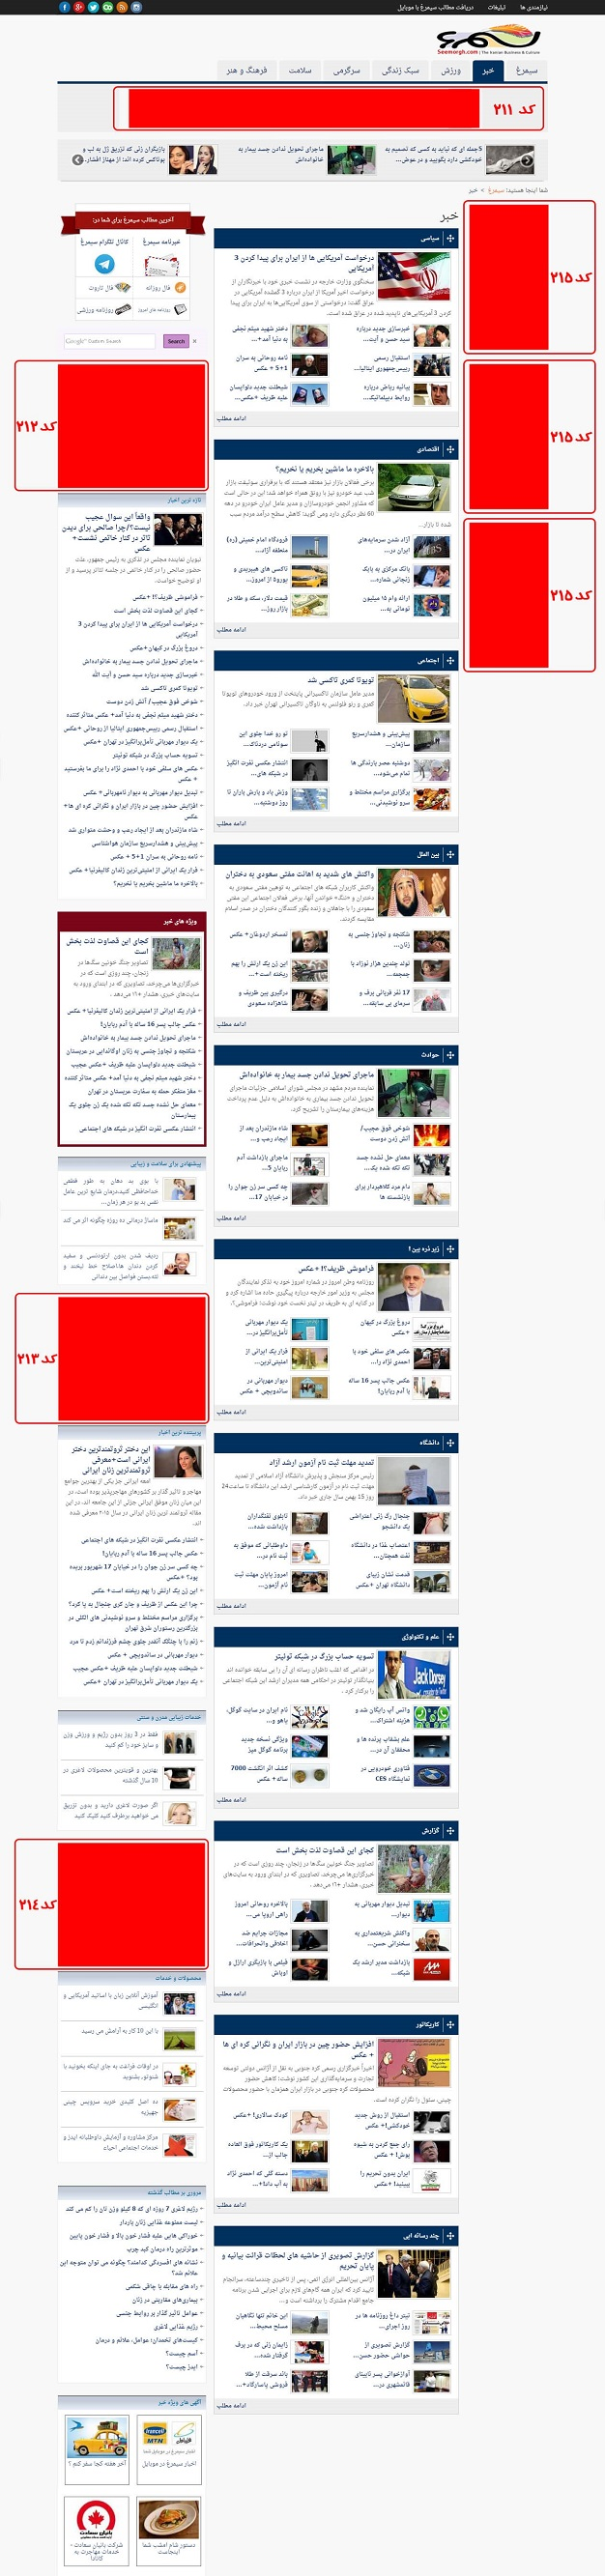 2-seemorgh-banner-news.jpg